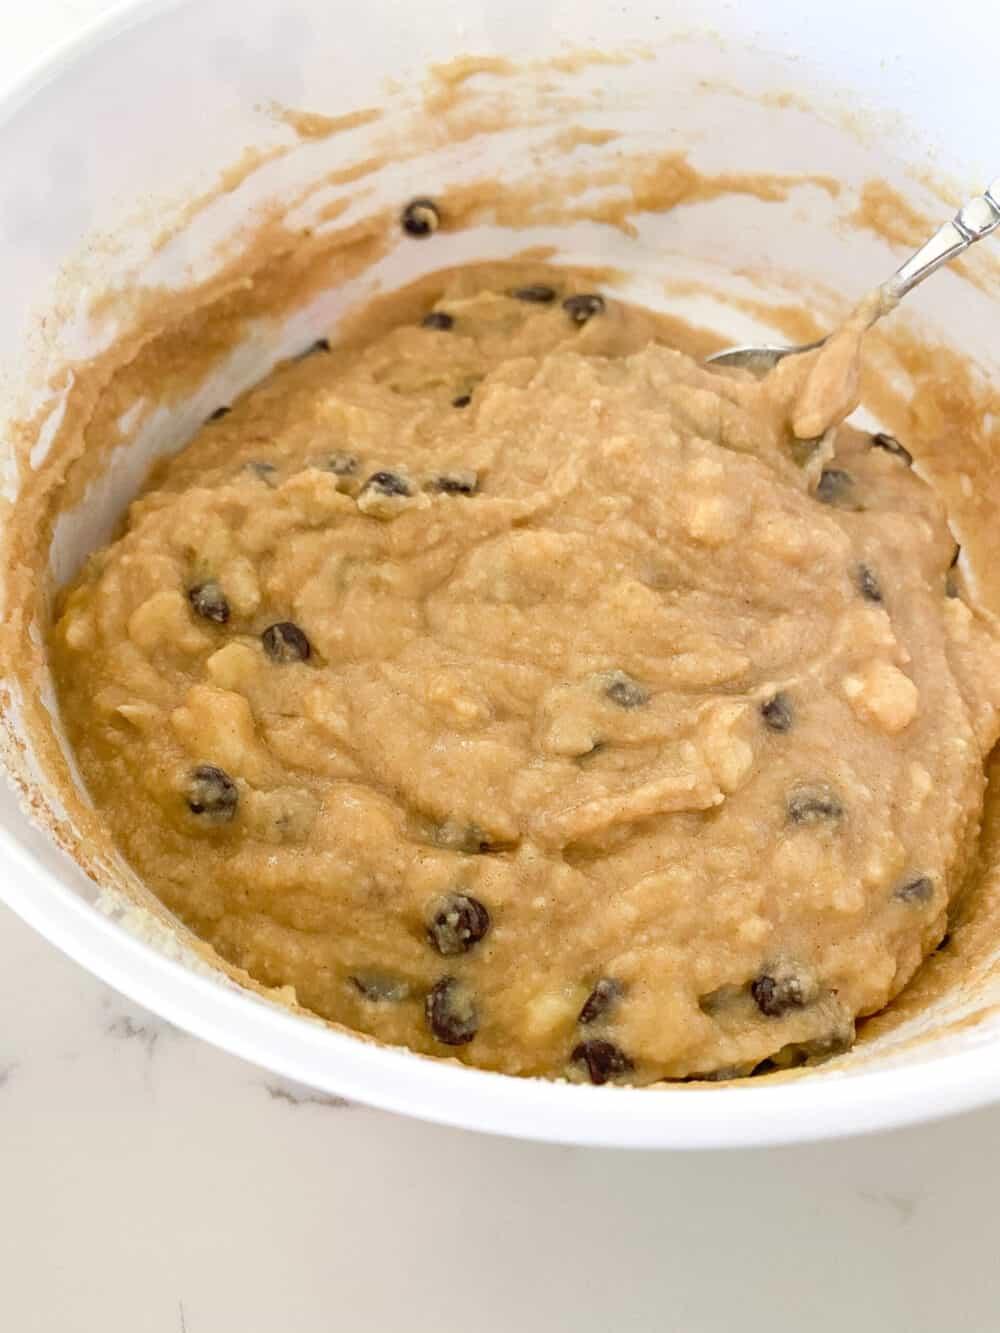 keto banana bread batter mixed in bowl